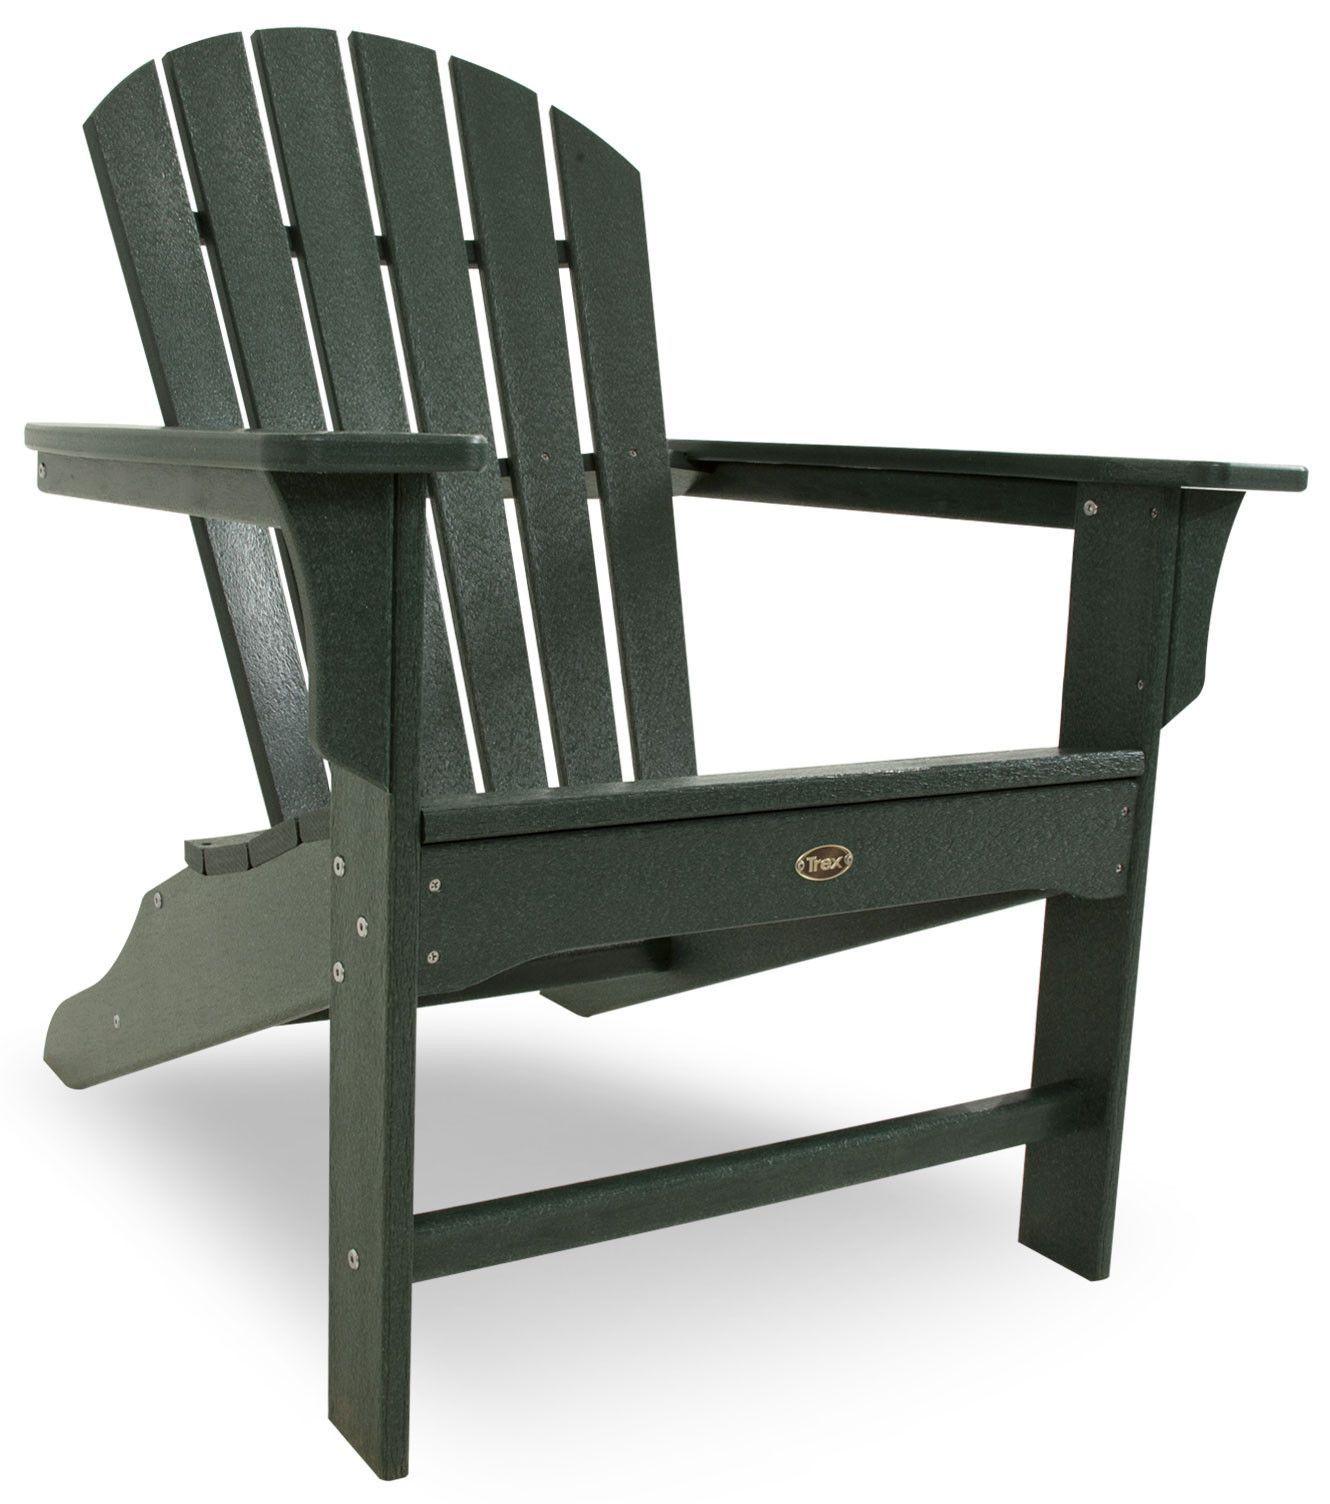 Diy Adirondack Chair Trex Outdoor Bistro Furniture Cape Cod Hdpe Lumber Outdoorsrockingchair Com